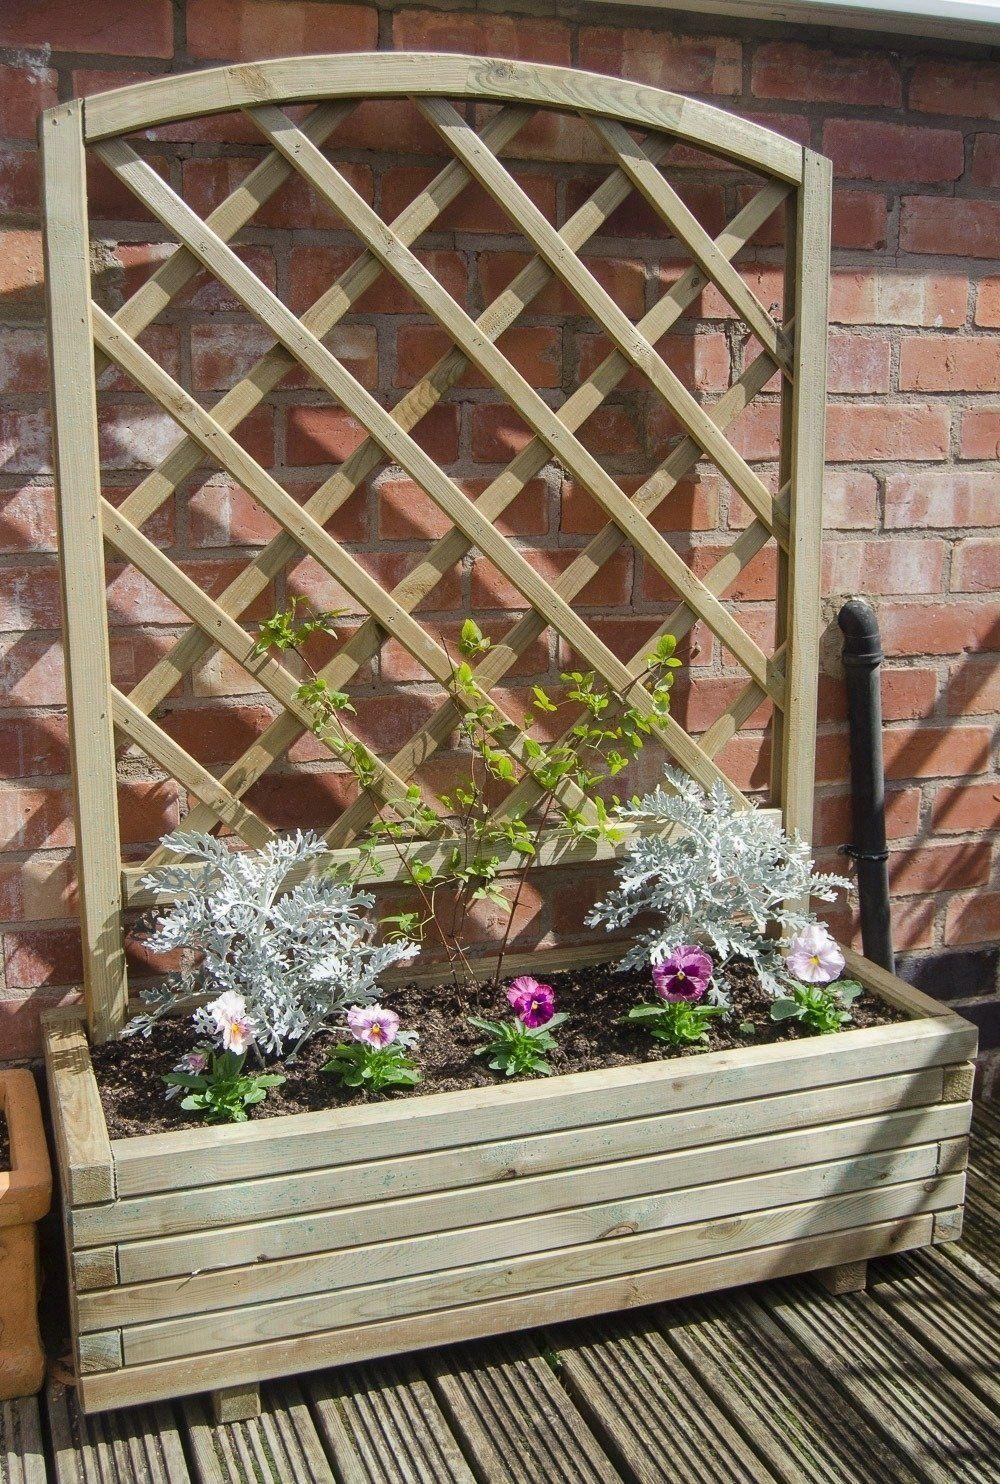 Forest Toulouse Garden Trellis Planter | Garden Planters | Pinterest ...